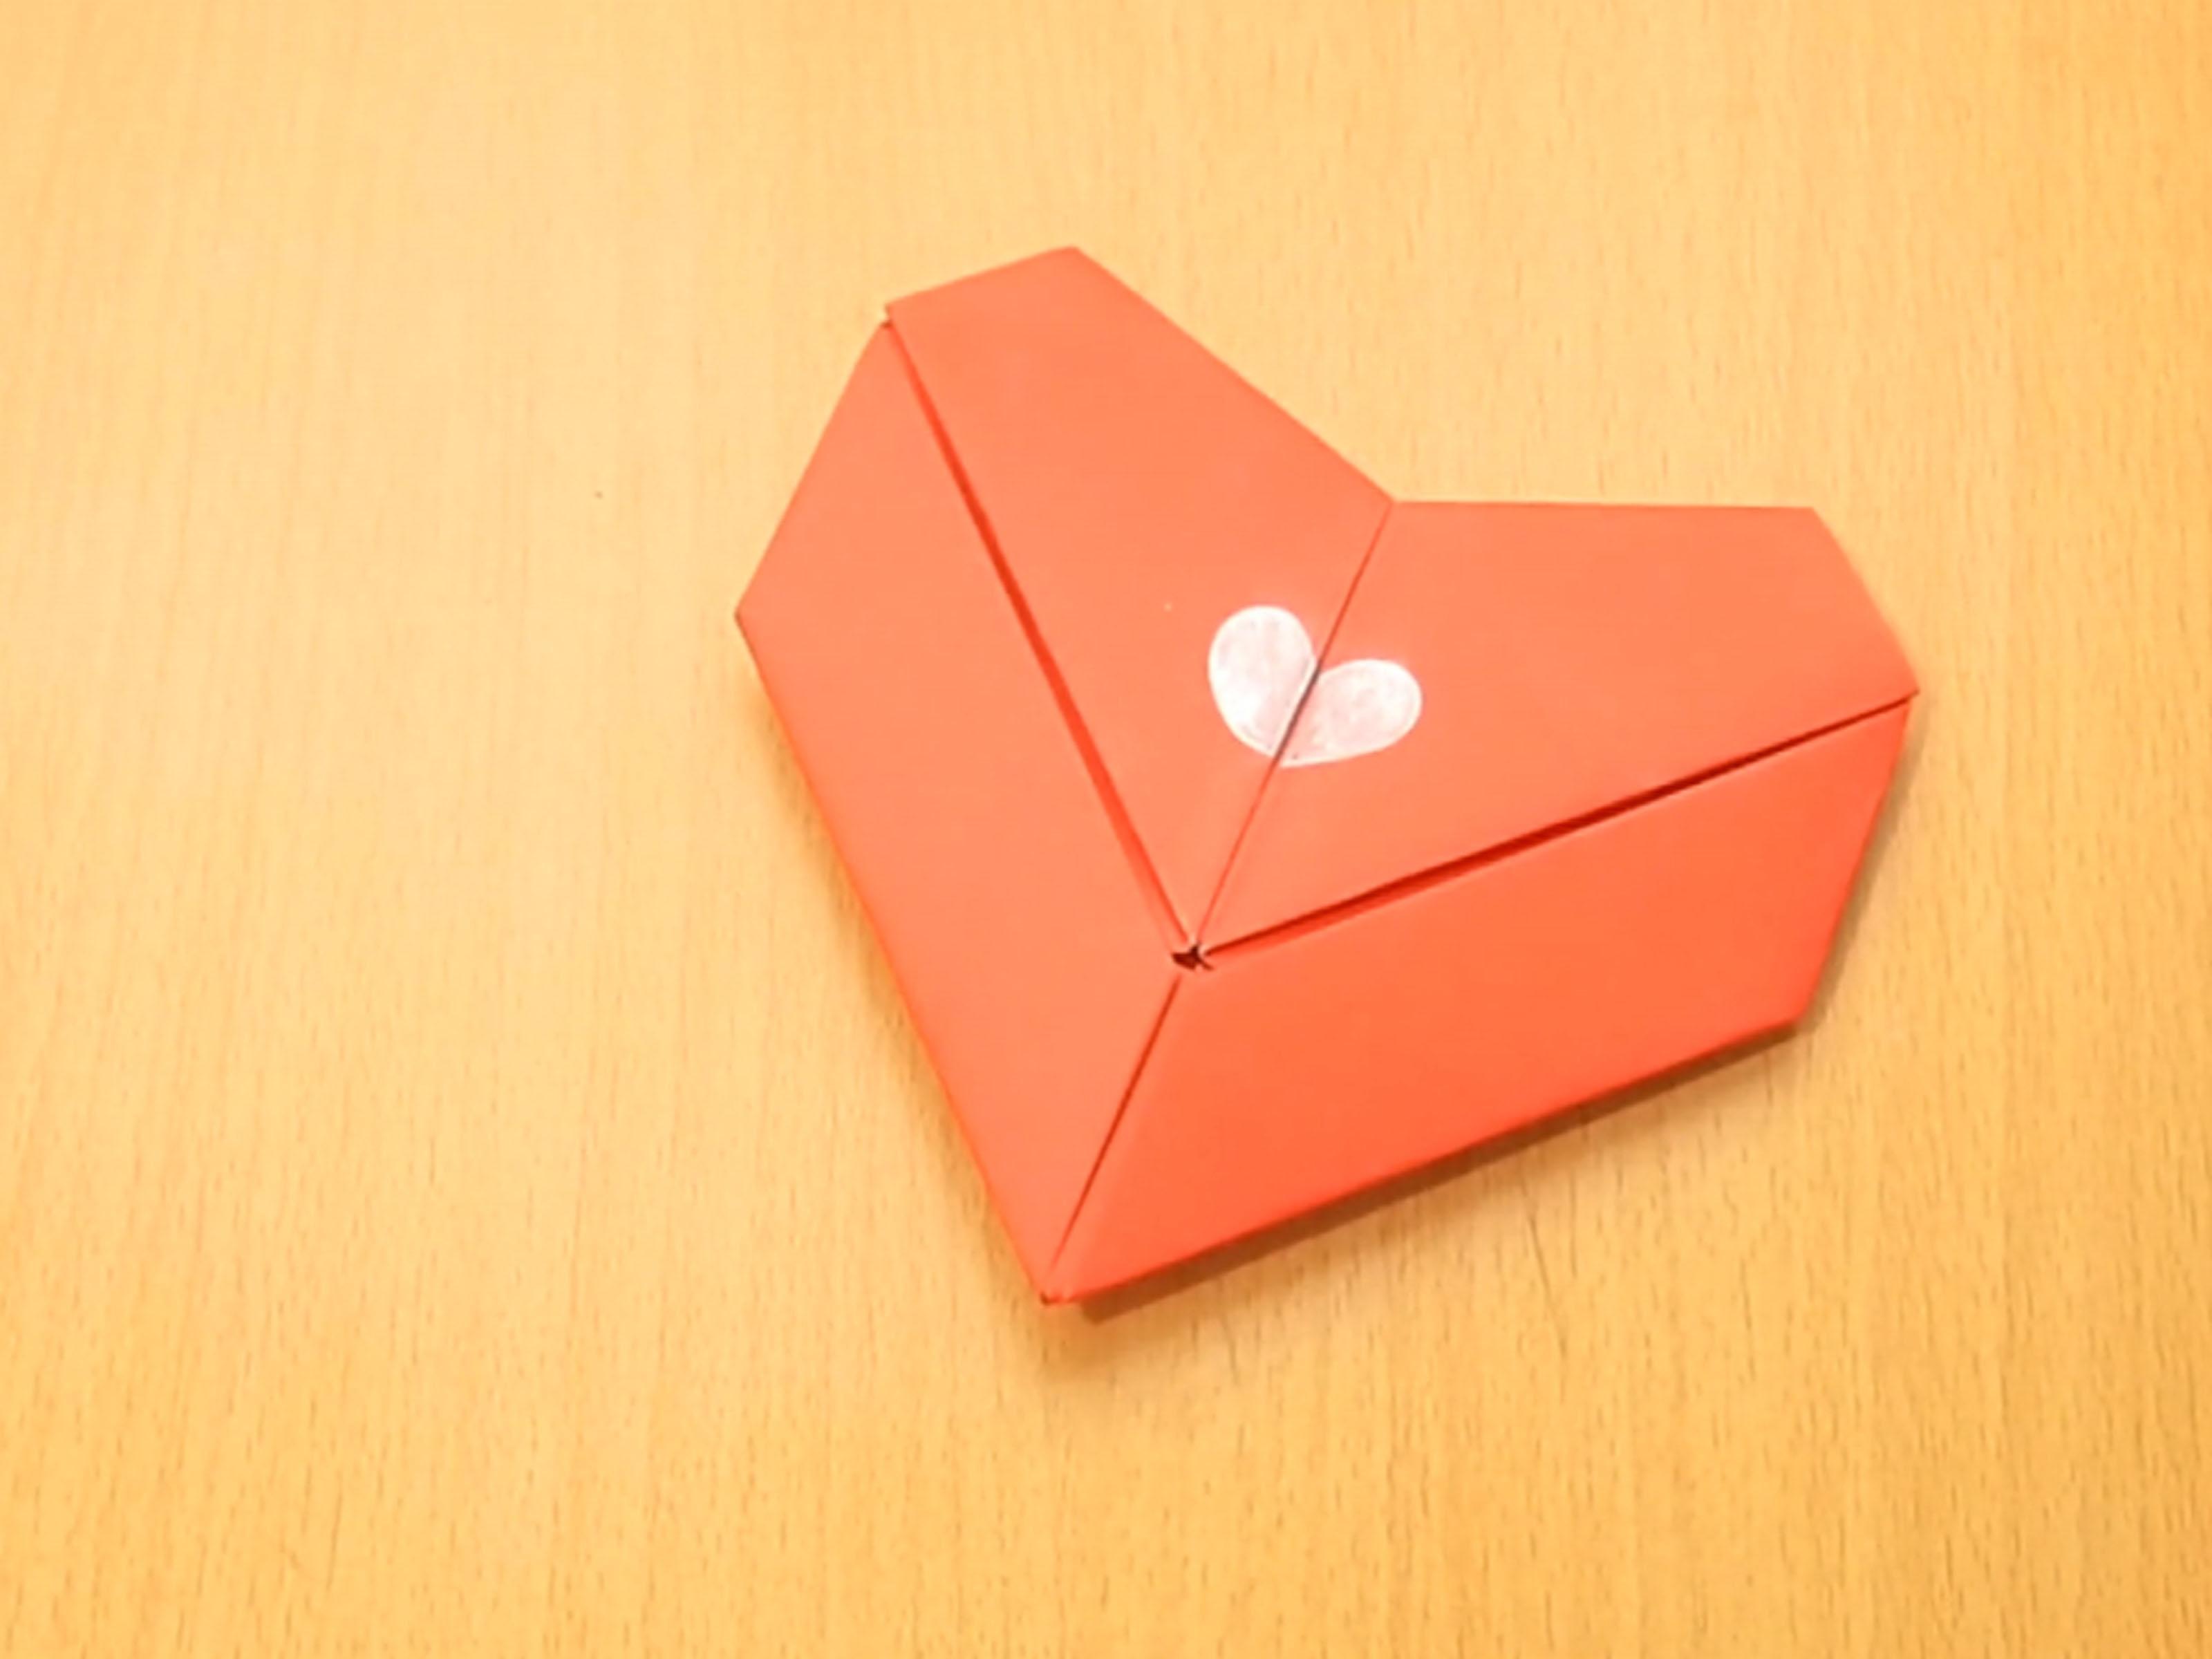 Fantastic Make An Origami Heart Step 15 Version 3 How To Make A Heart Shaped Cake How To Make A Heart Paper art How To Make A Heart